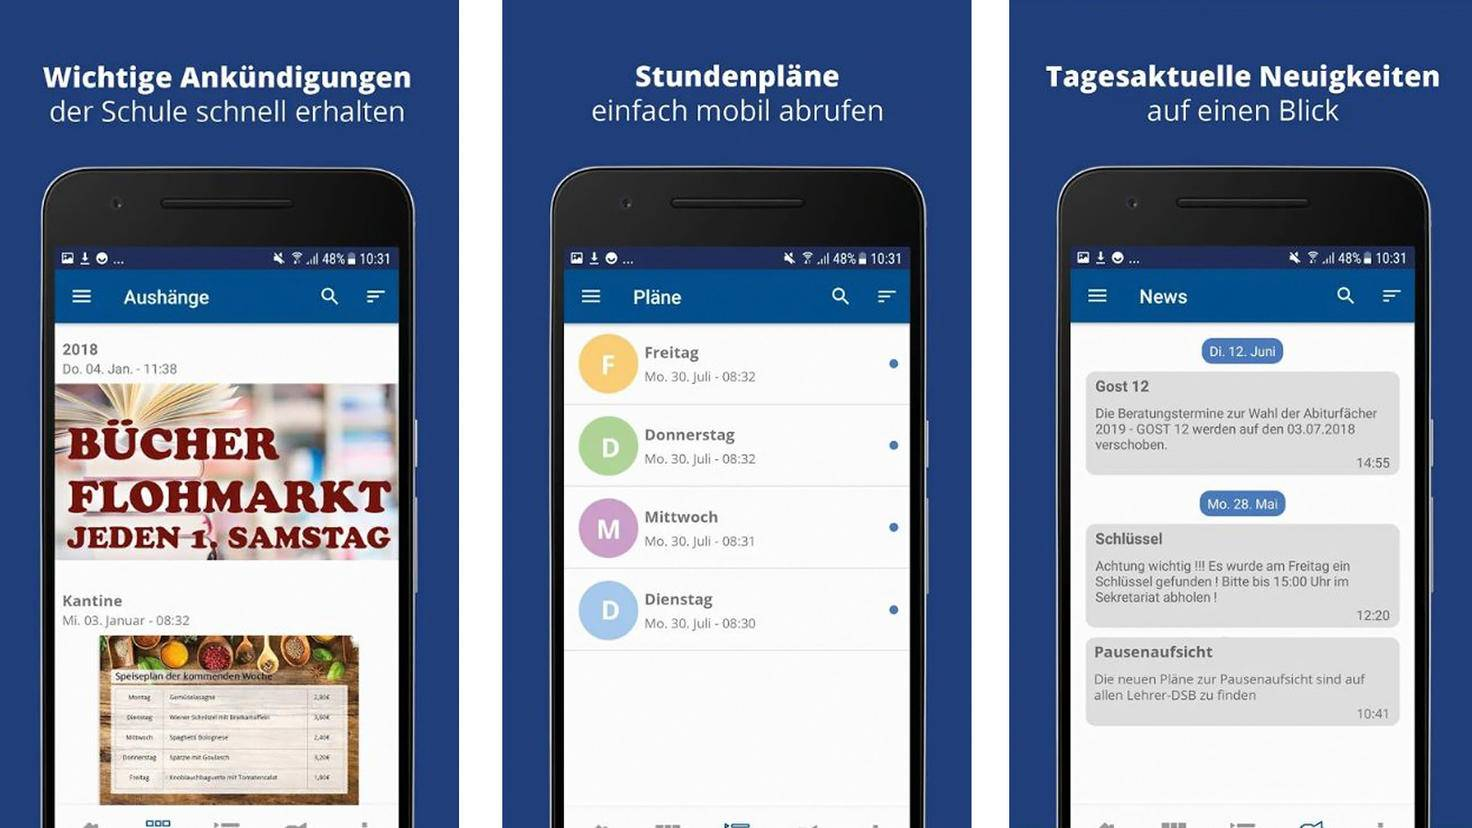 IHK SchulApp-Google PlayStore-heinekingmedia GmbH